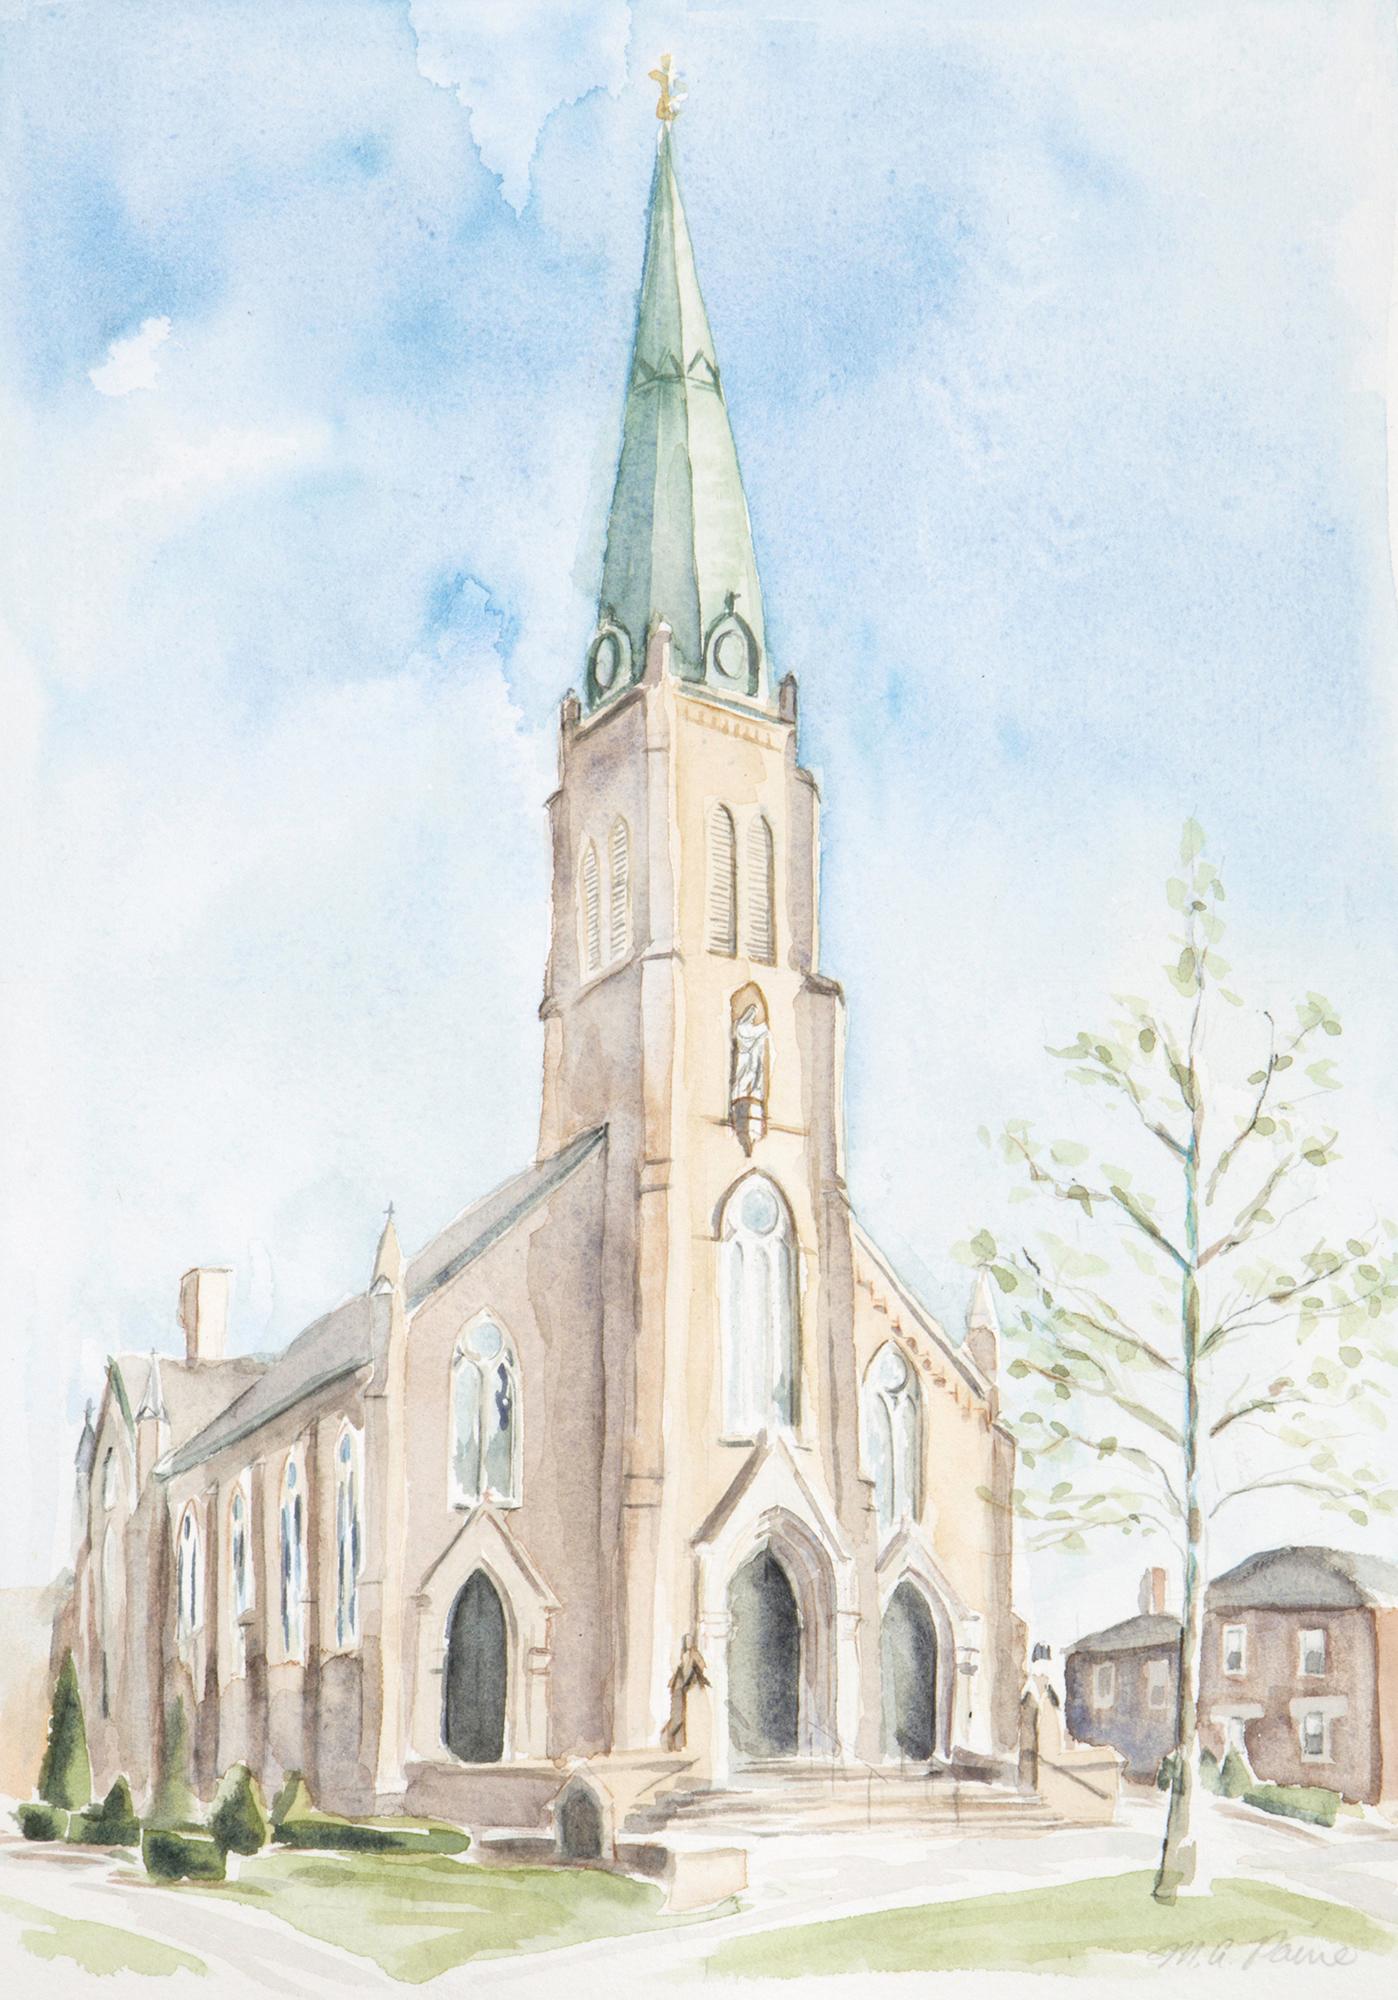 St rose church print small zdflhb